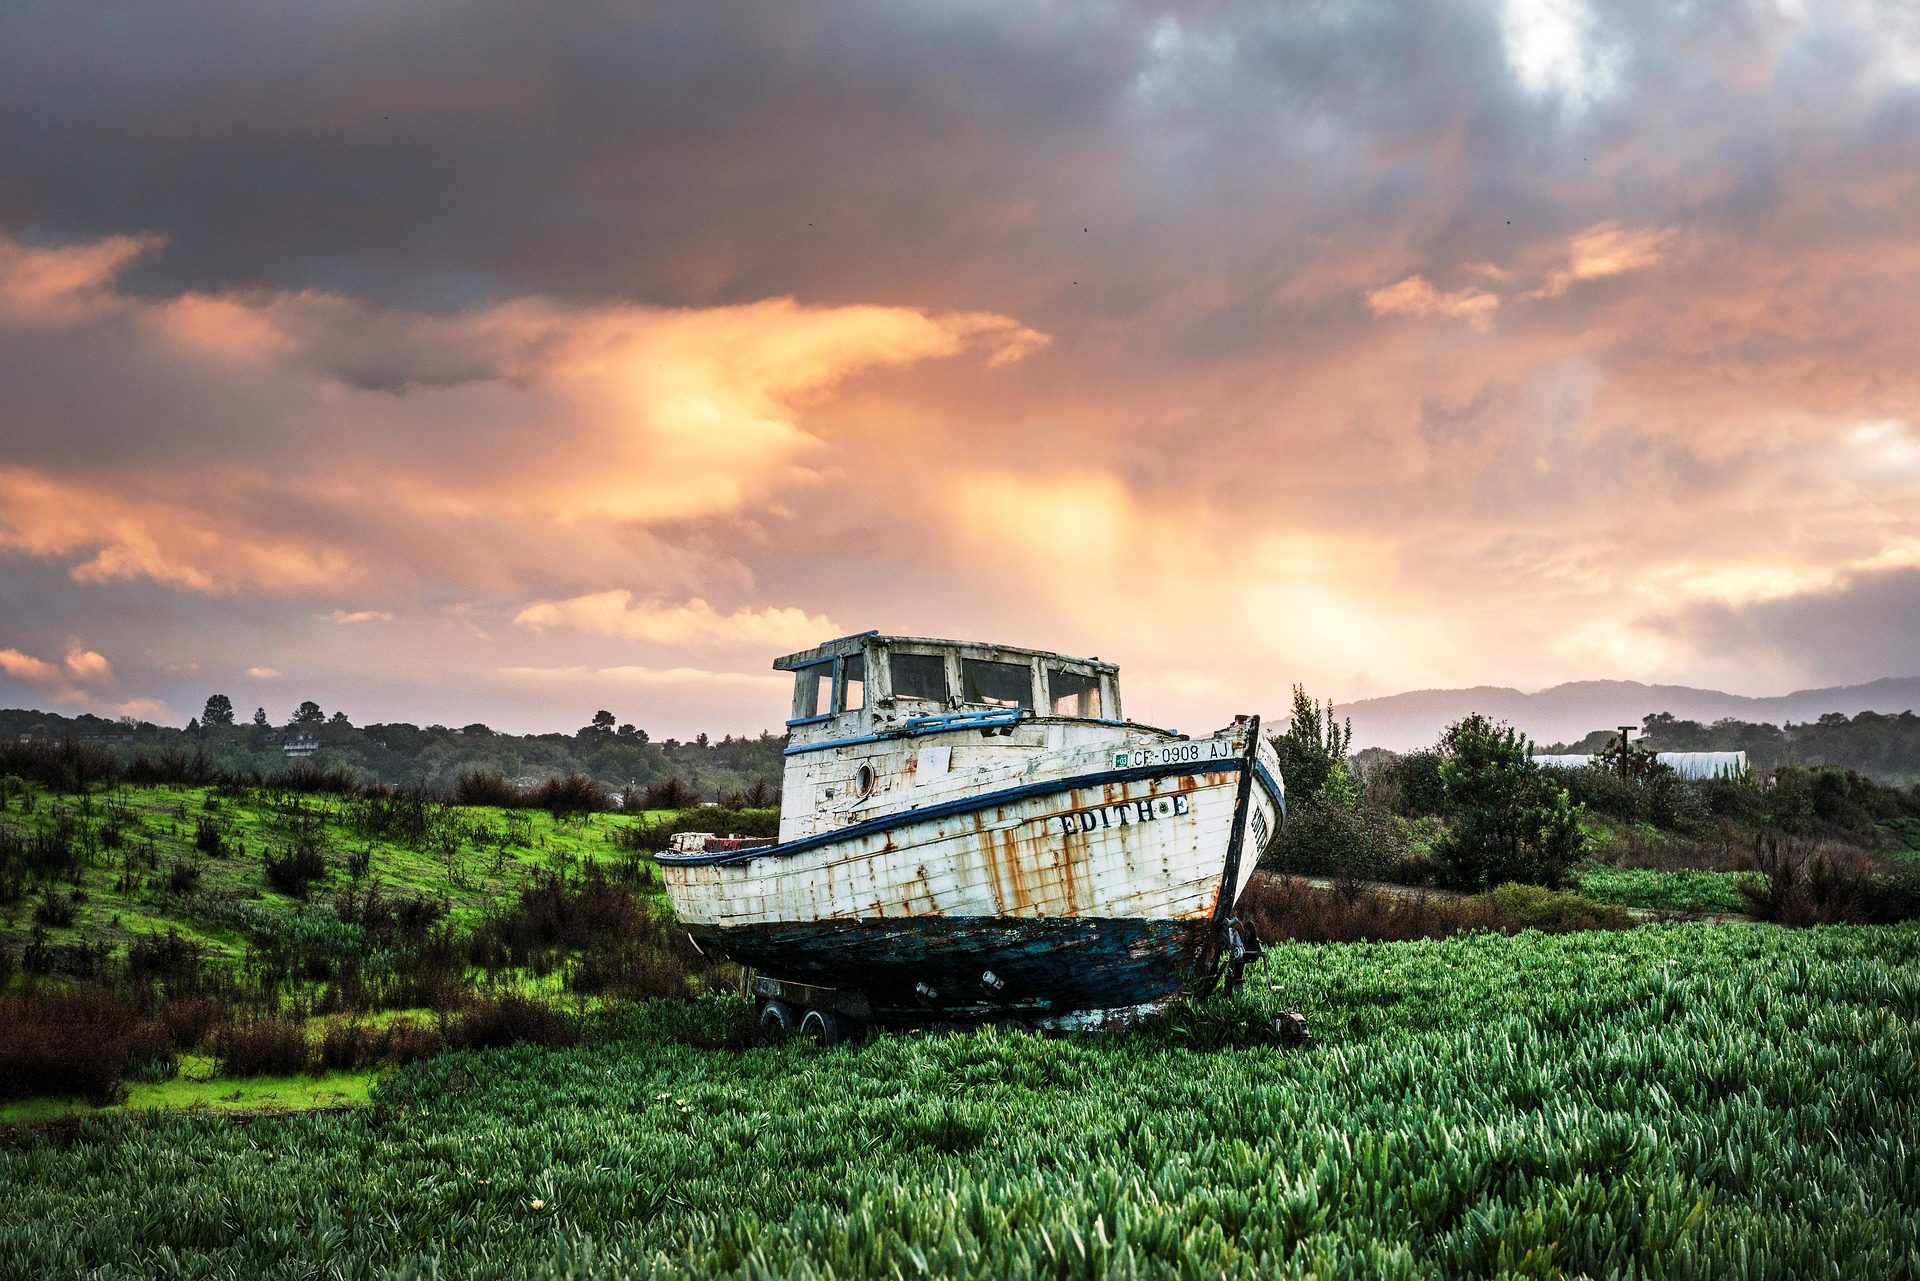 barco, pesca, 釣り, はしけ, ボート, 空, フィールド, 雲 - HD の壁紙 - 教授-falken.com